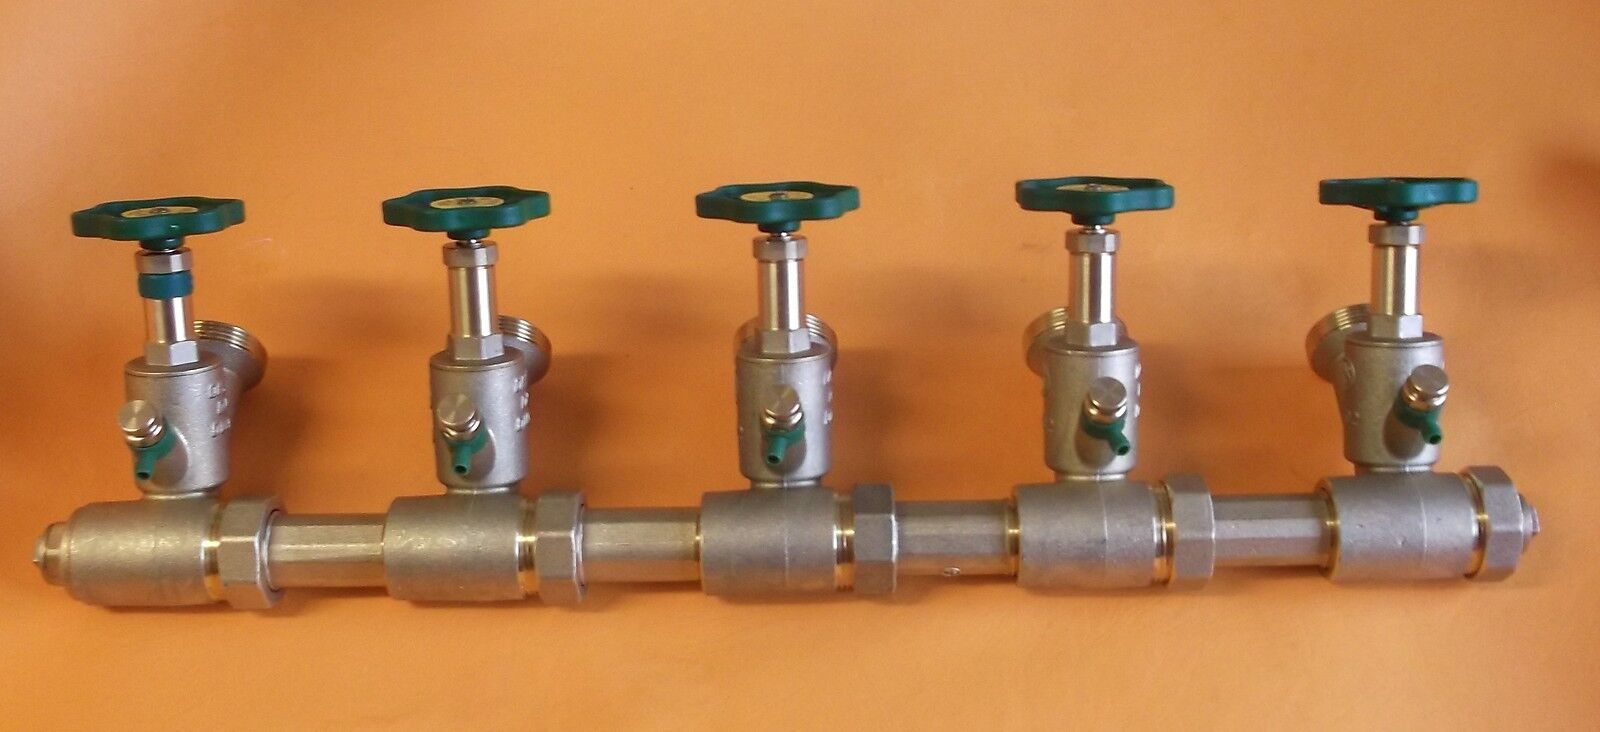 Schlößer Verteiler Kompaktverteiler Wasserverteiler DN25 A DN40, 5fach   9310285